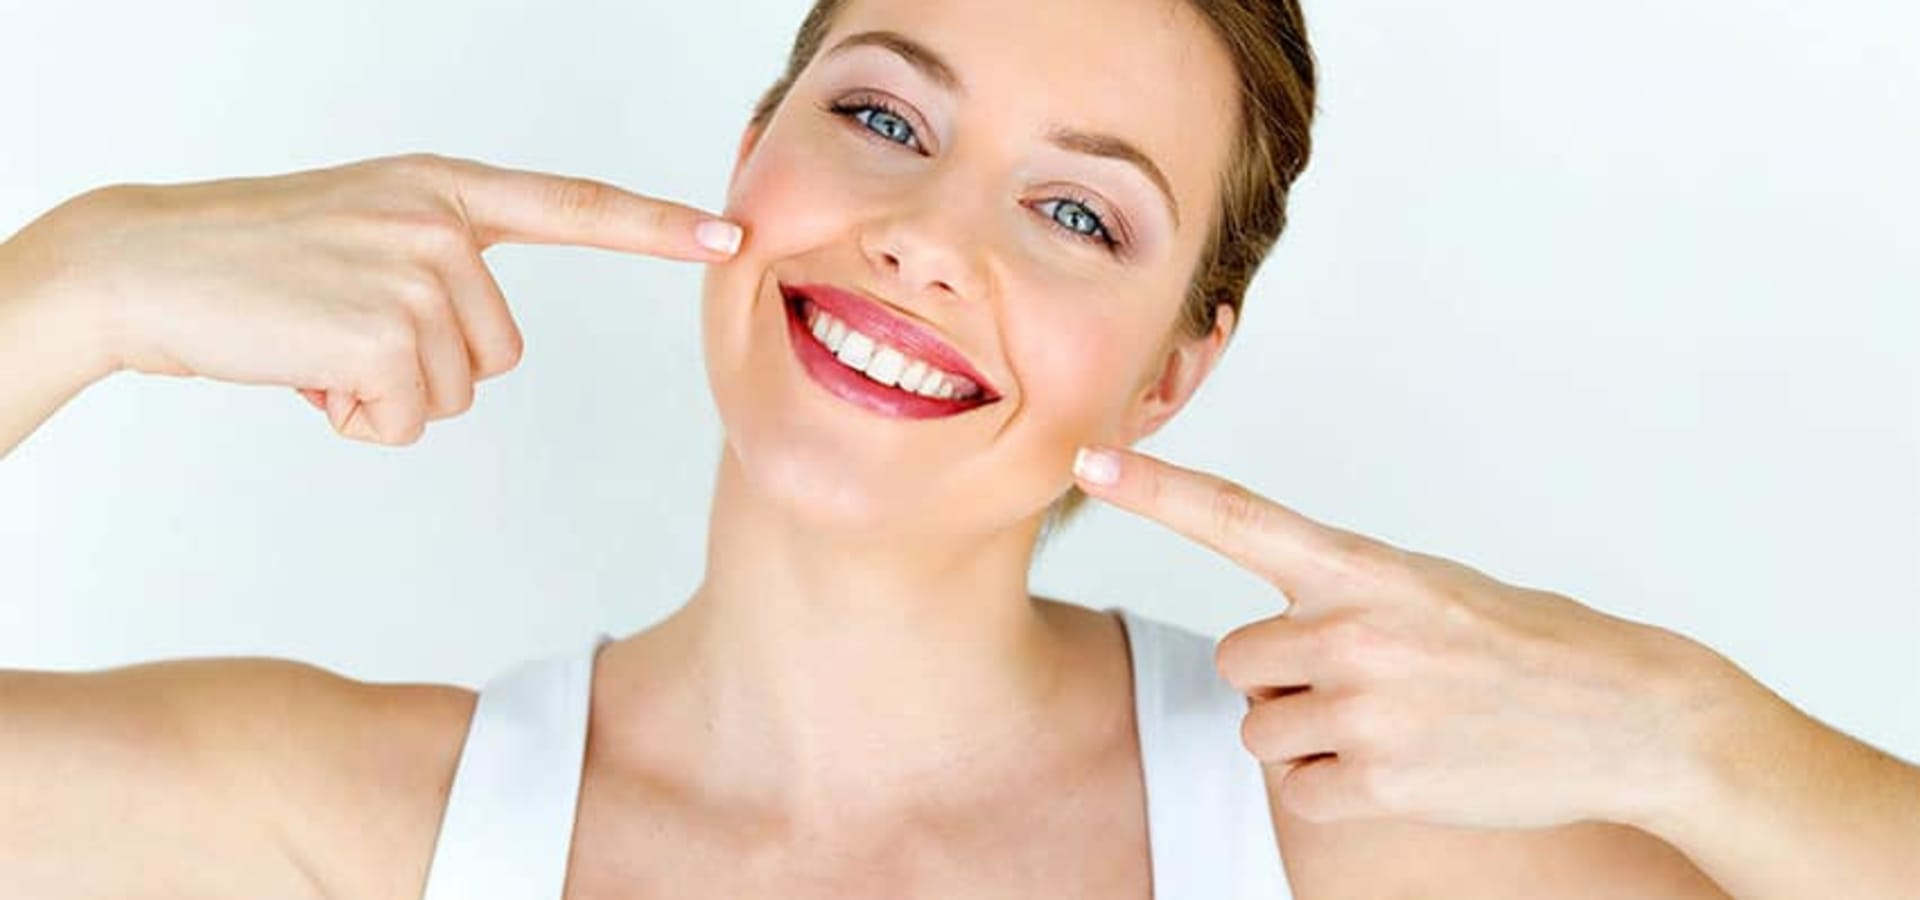 Dentitox Pro Consumer Reviews